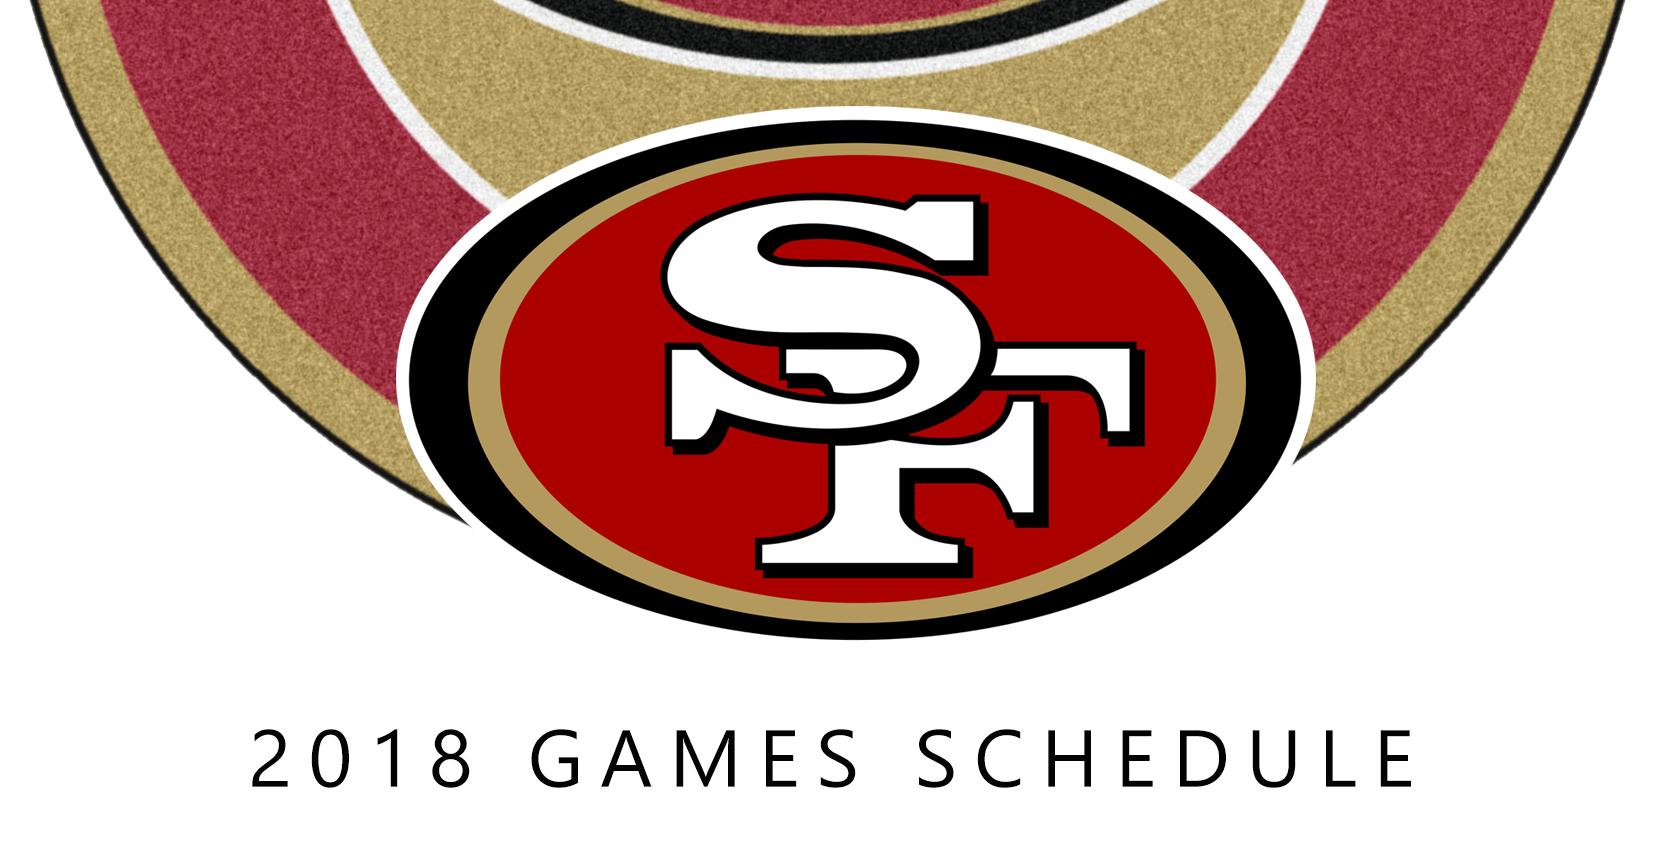 San Fransisco 49ers 2018 games schedule